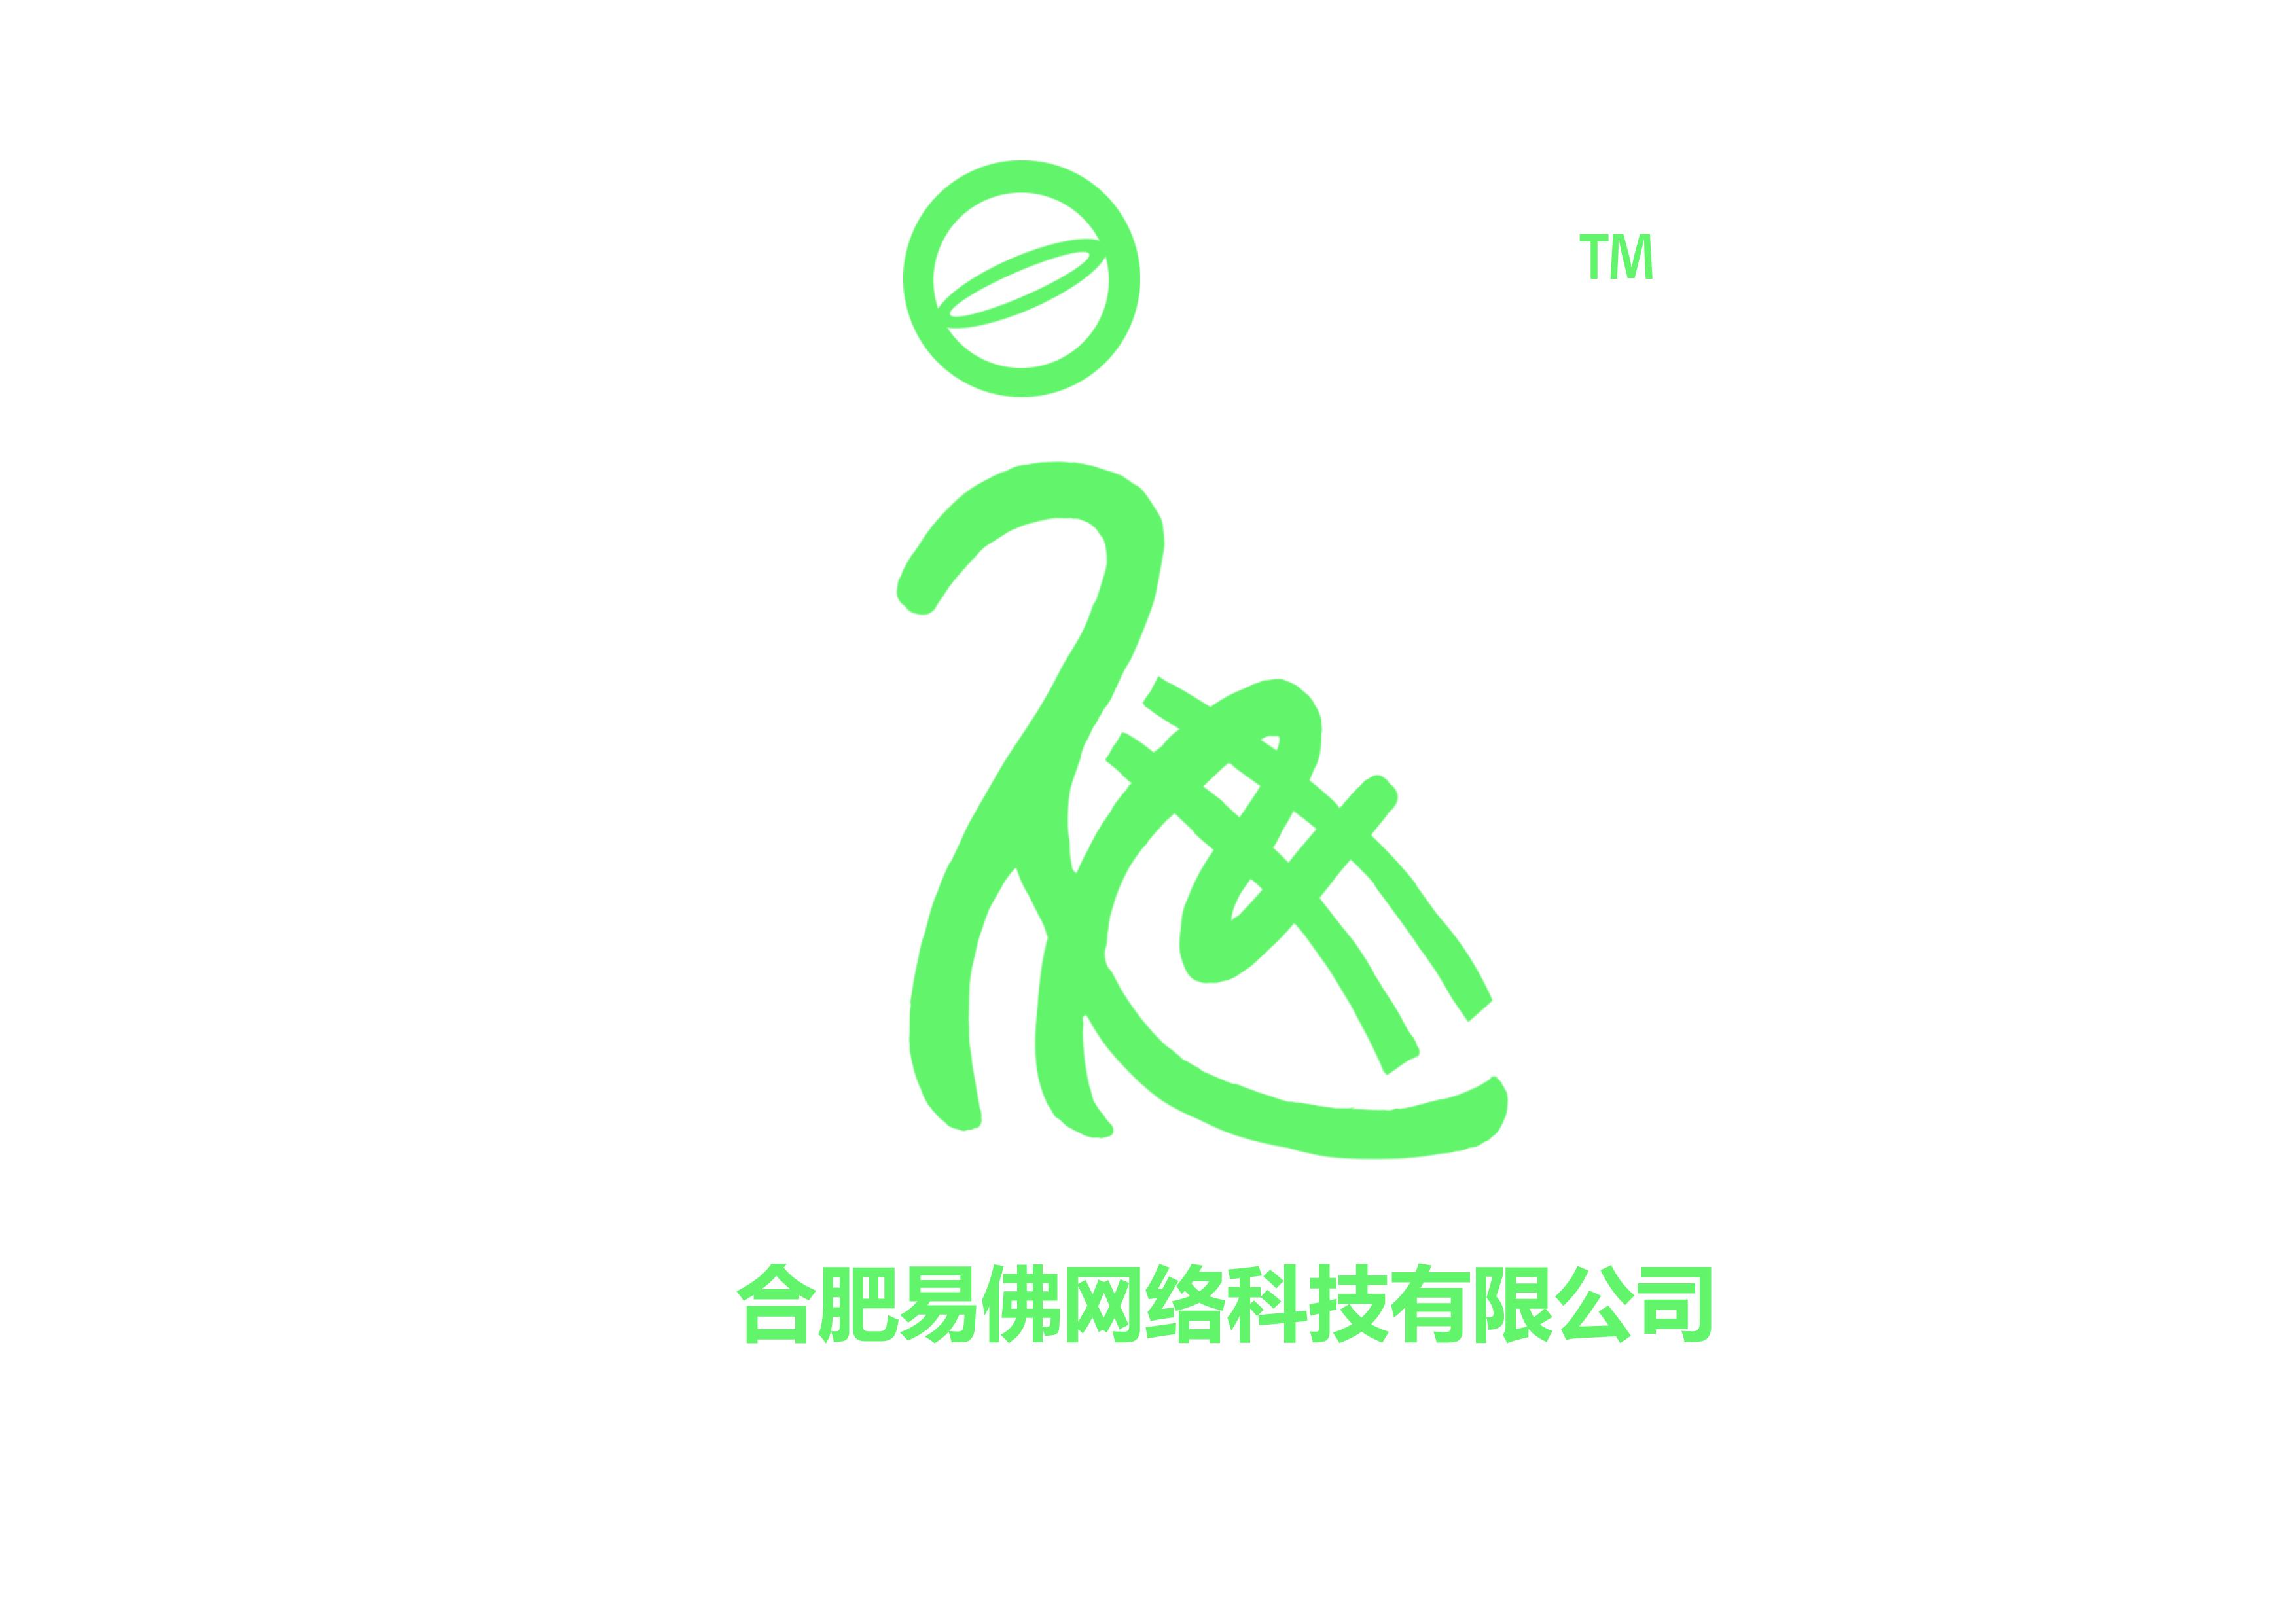 logo logo 标志 设计 图标 3508_2480